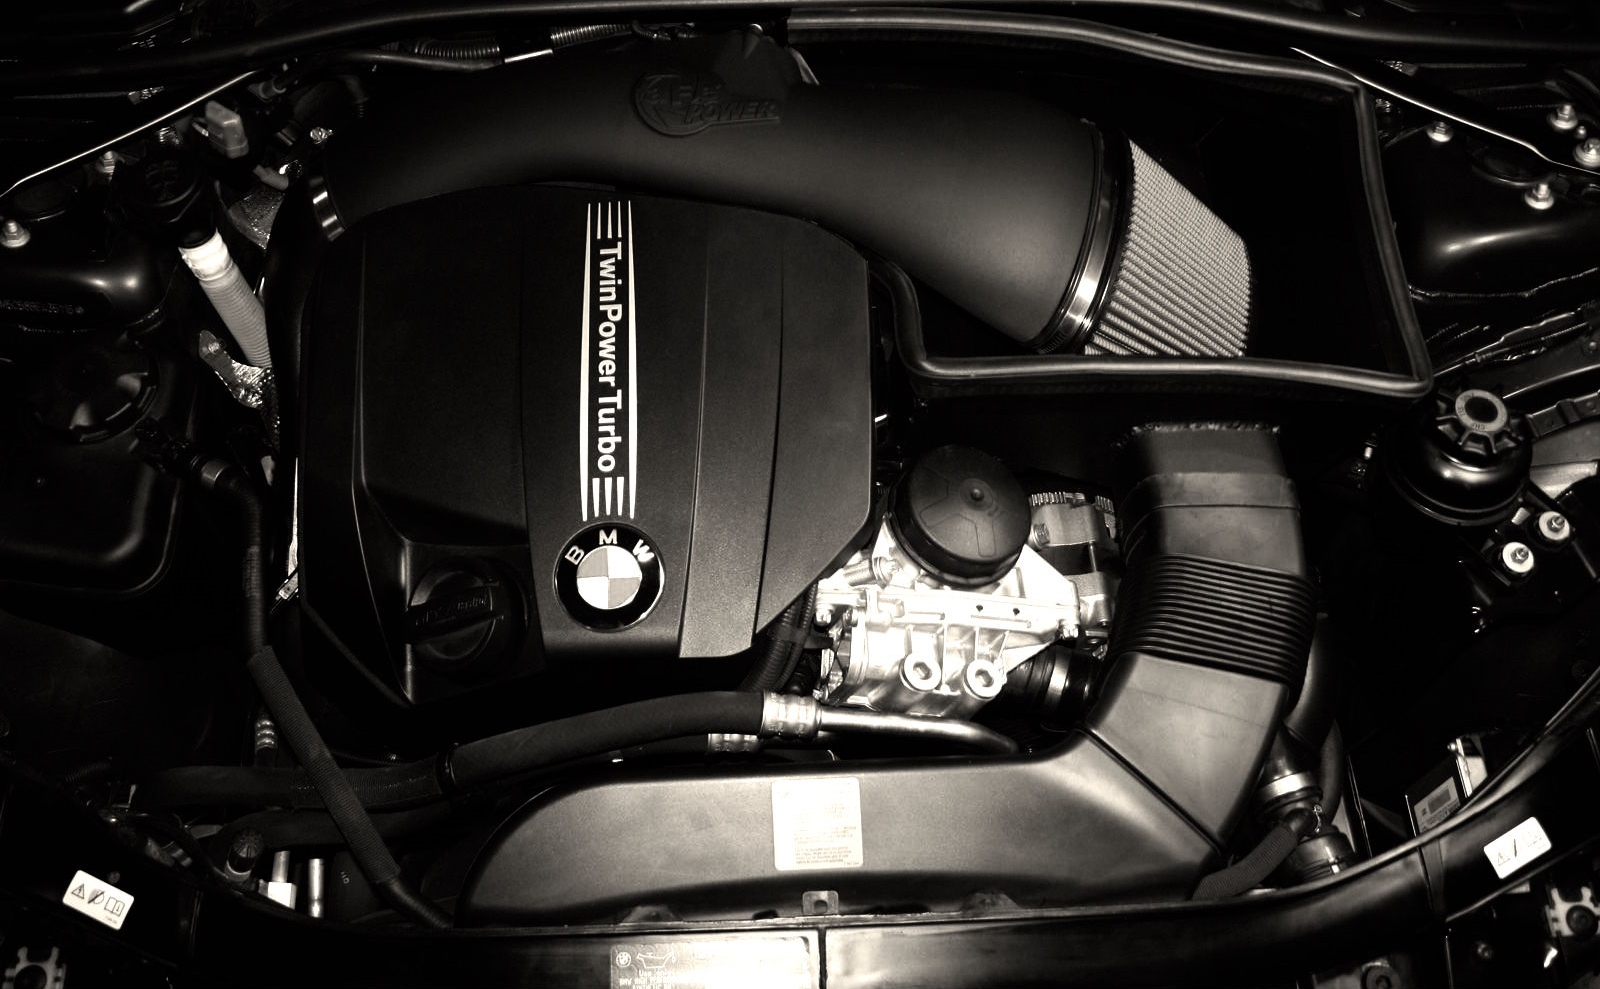 355i Engine.jpg